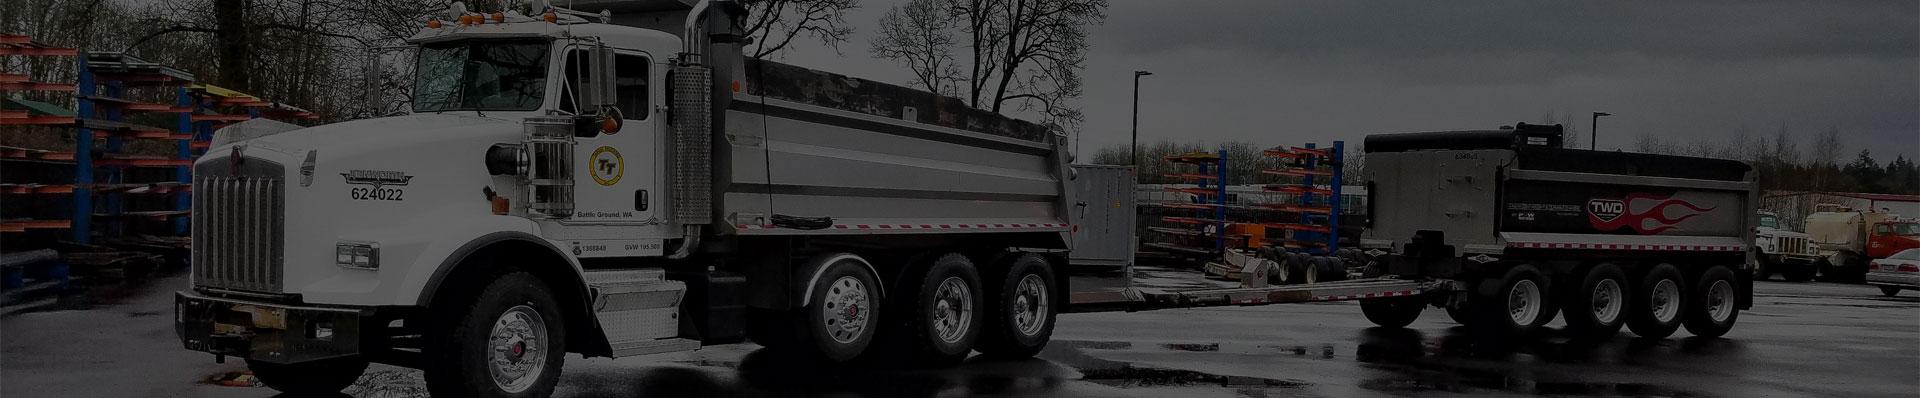 Careers at Tapani Trucking